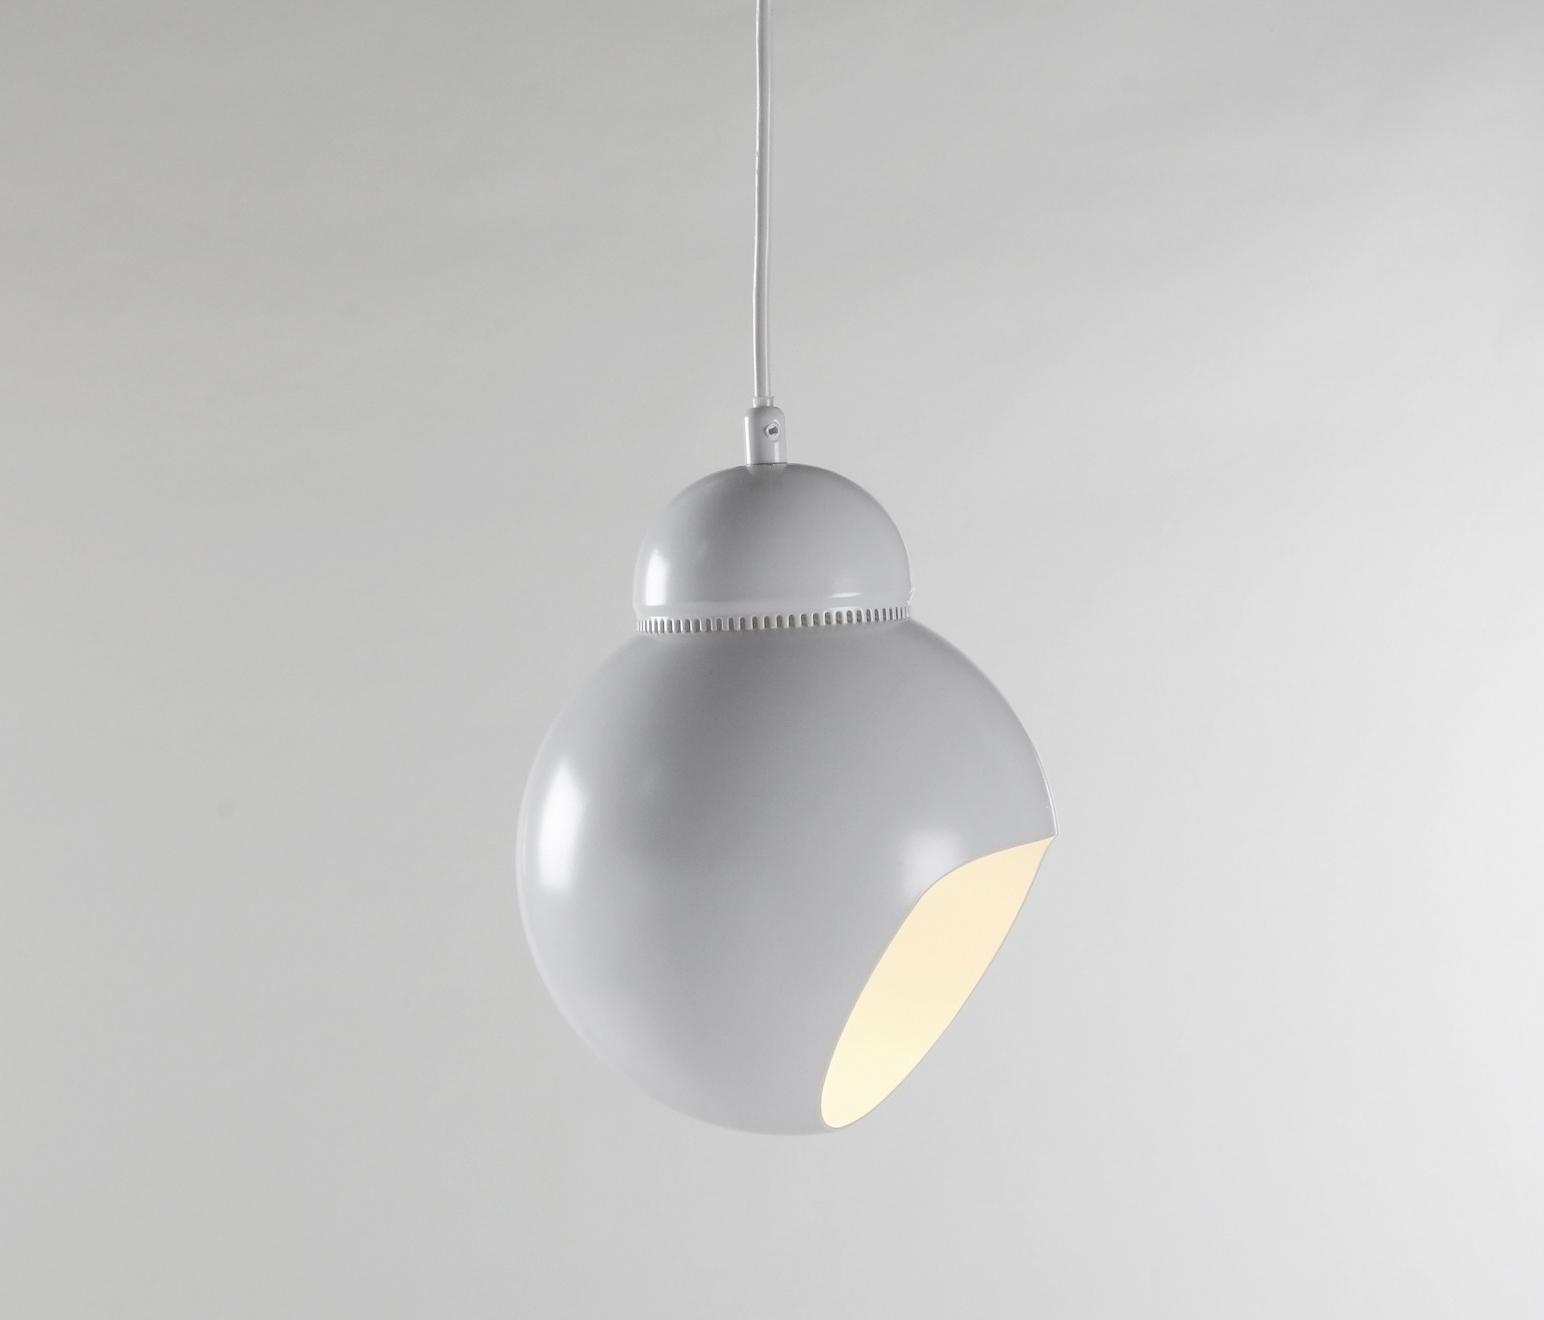 Artek products lighting pendant light a338 - Pendant Lamp A338 By Artek General Lighting